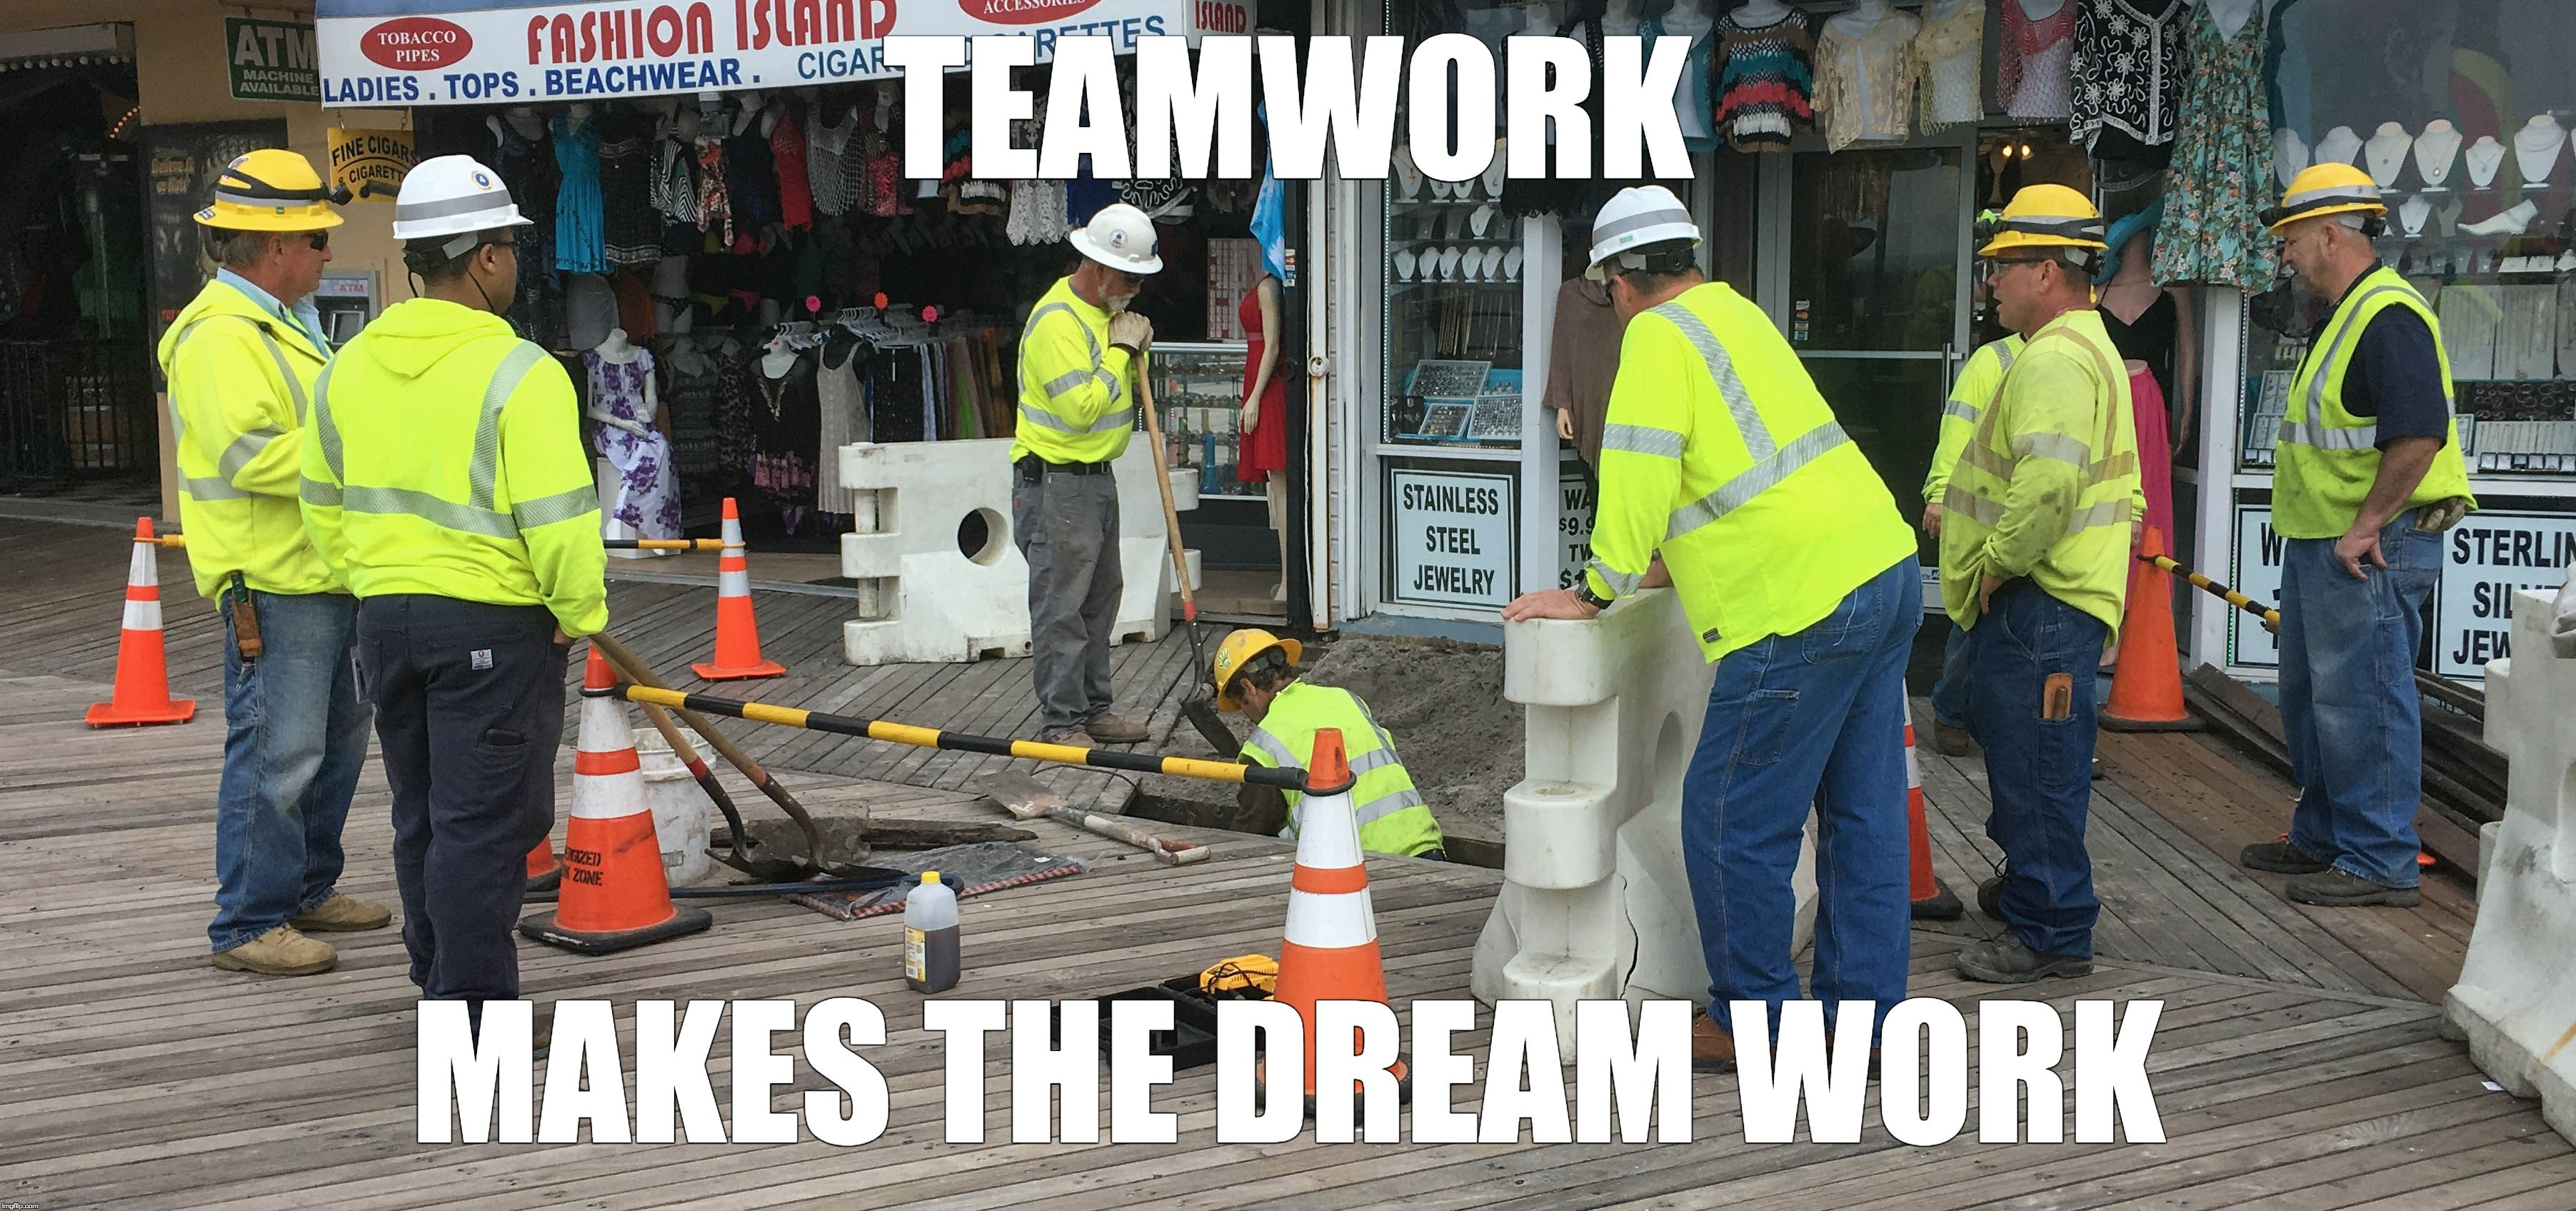 Teamwork makes the dream work. . . teamwork dream work